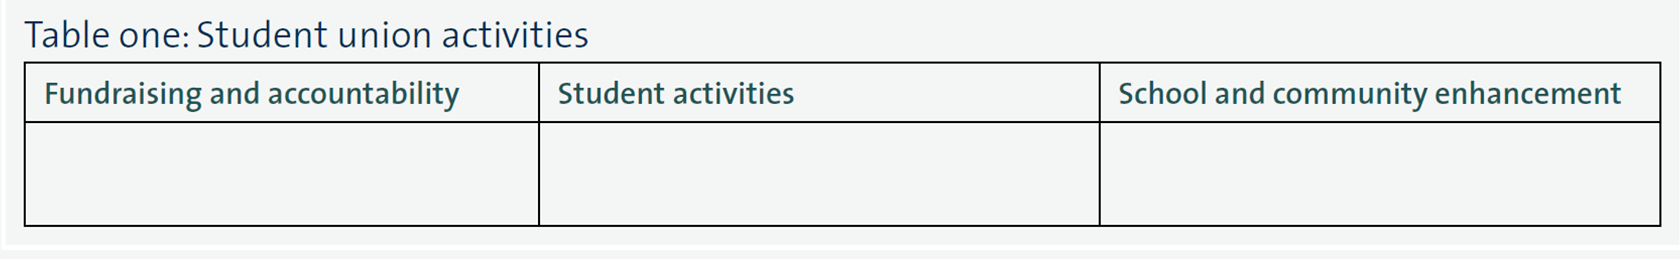 table1StudentUnionActivities